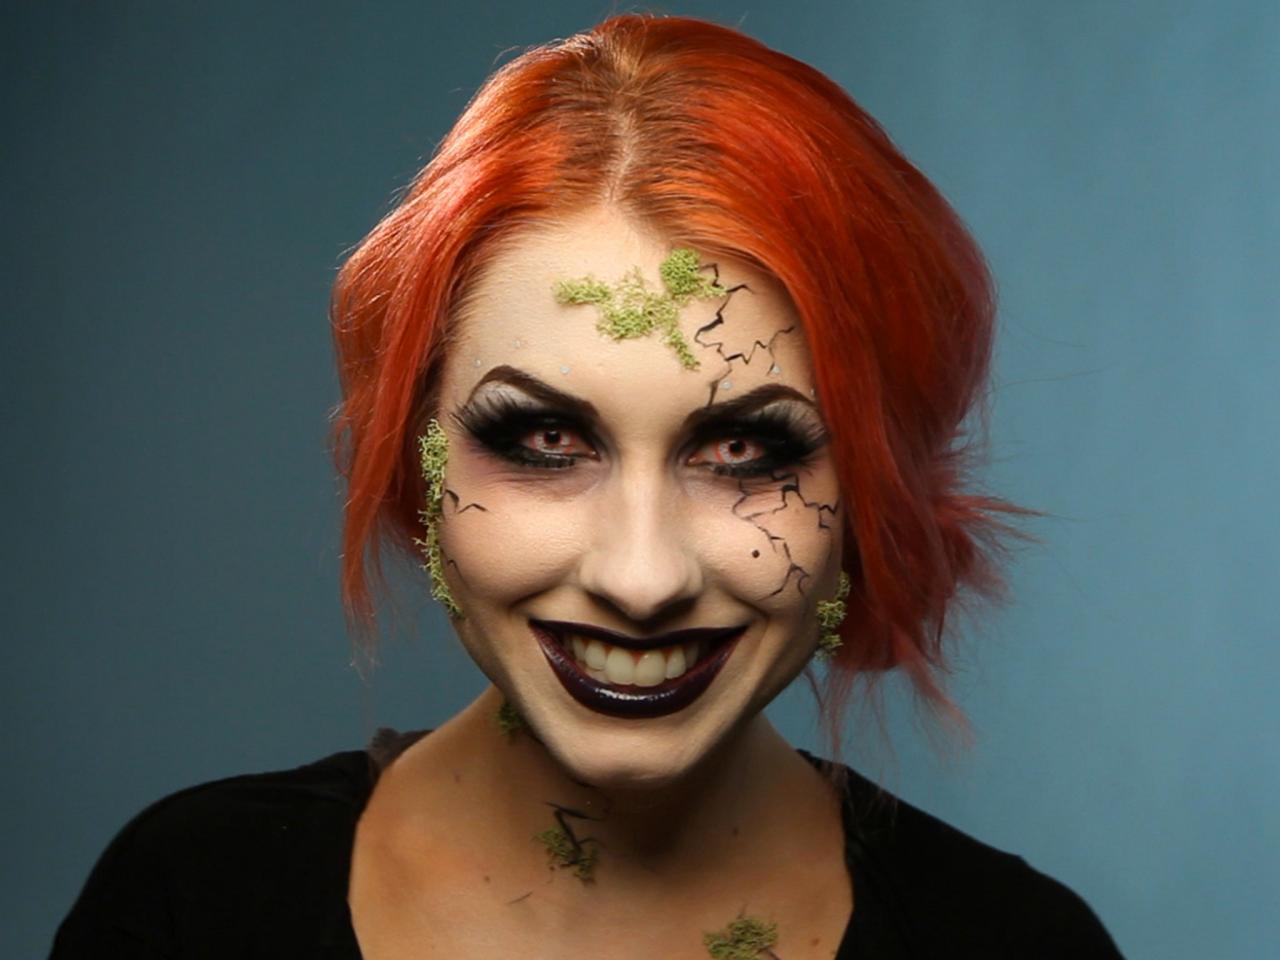 Adult Halloween Makeup Tutorial: Glam Dark Fairy | HGTV